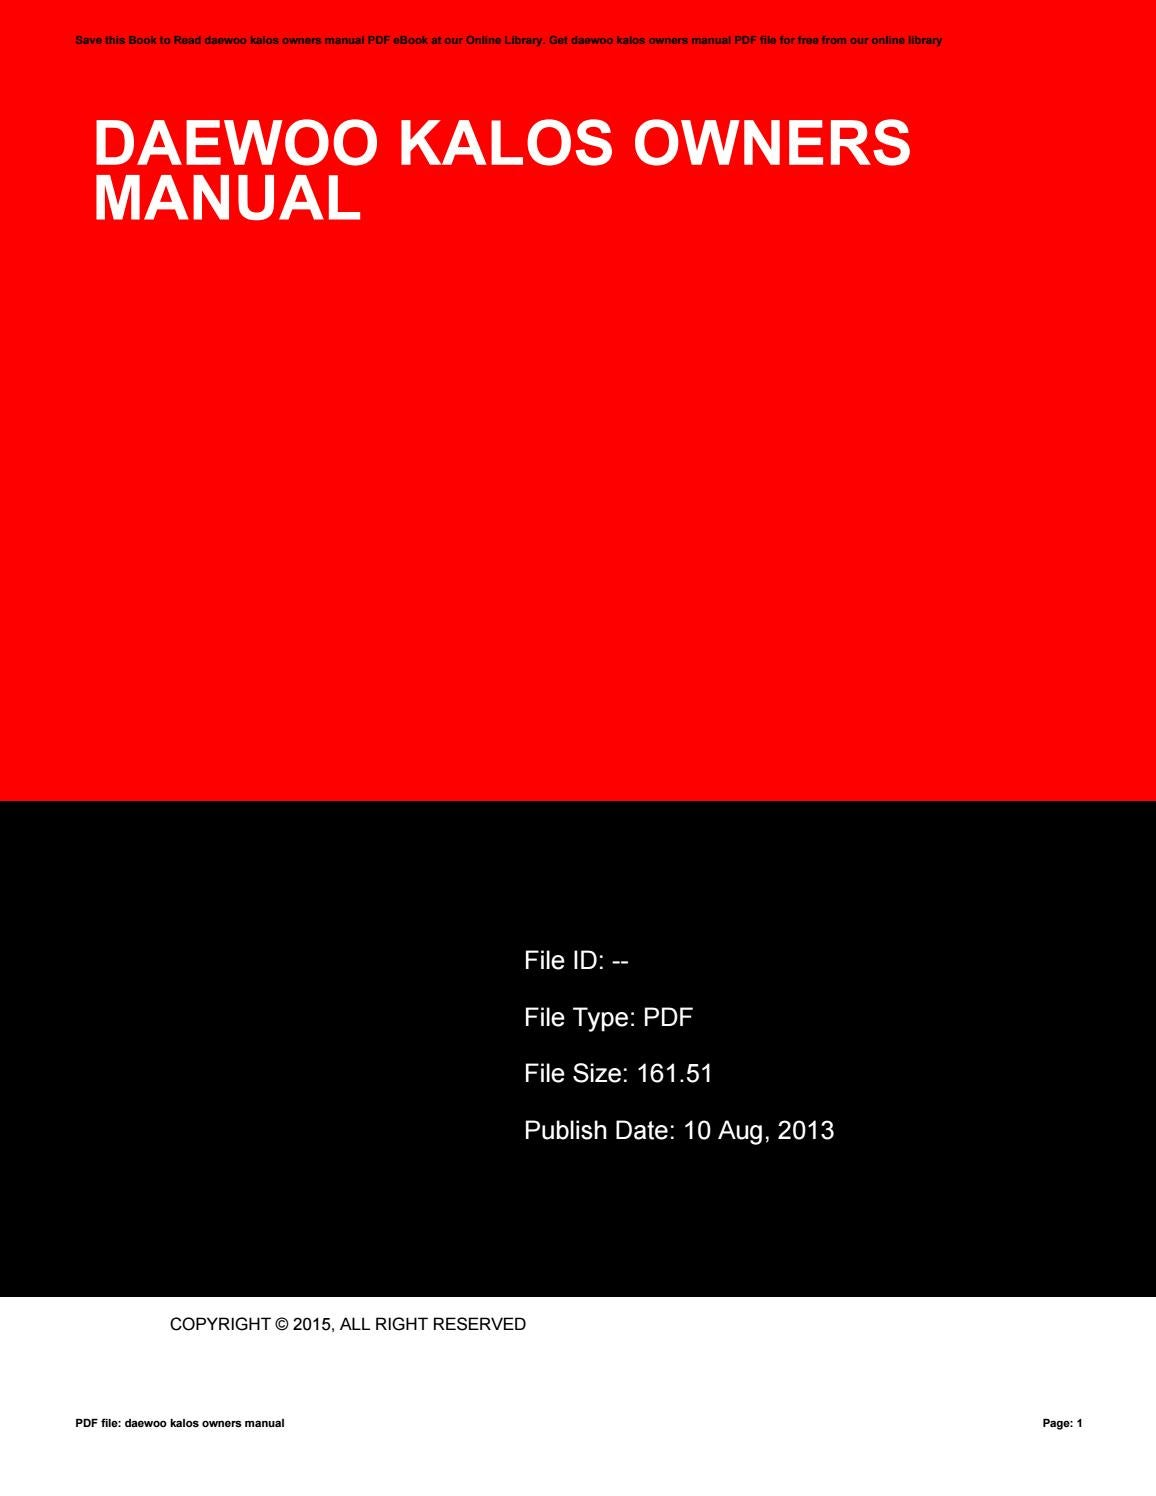 Daewoo kalos workshop manual pdf.